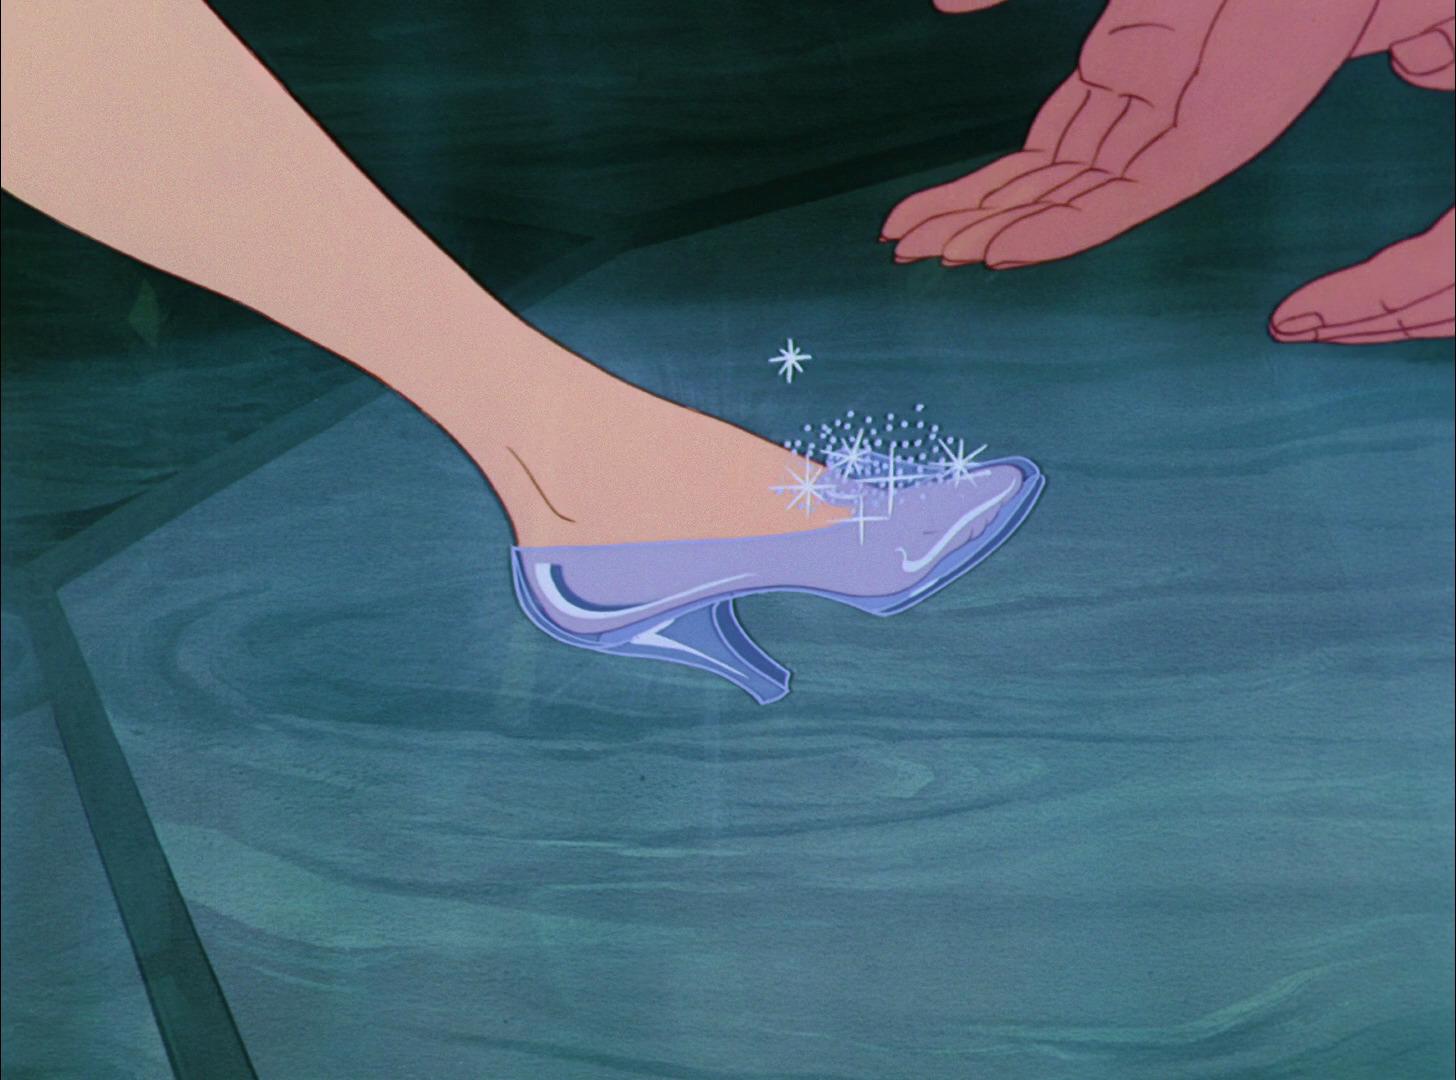 Live Action Cinderella Size Of Shoe